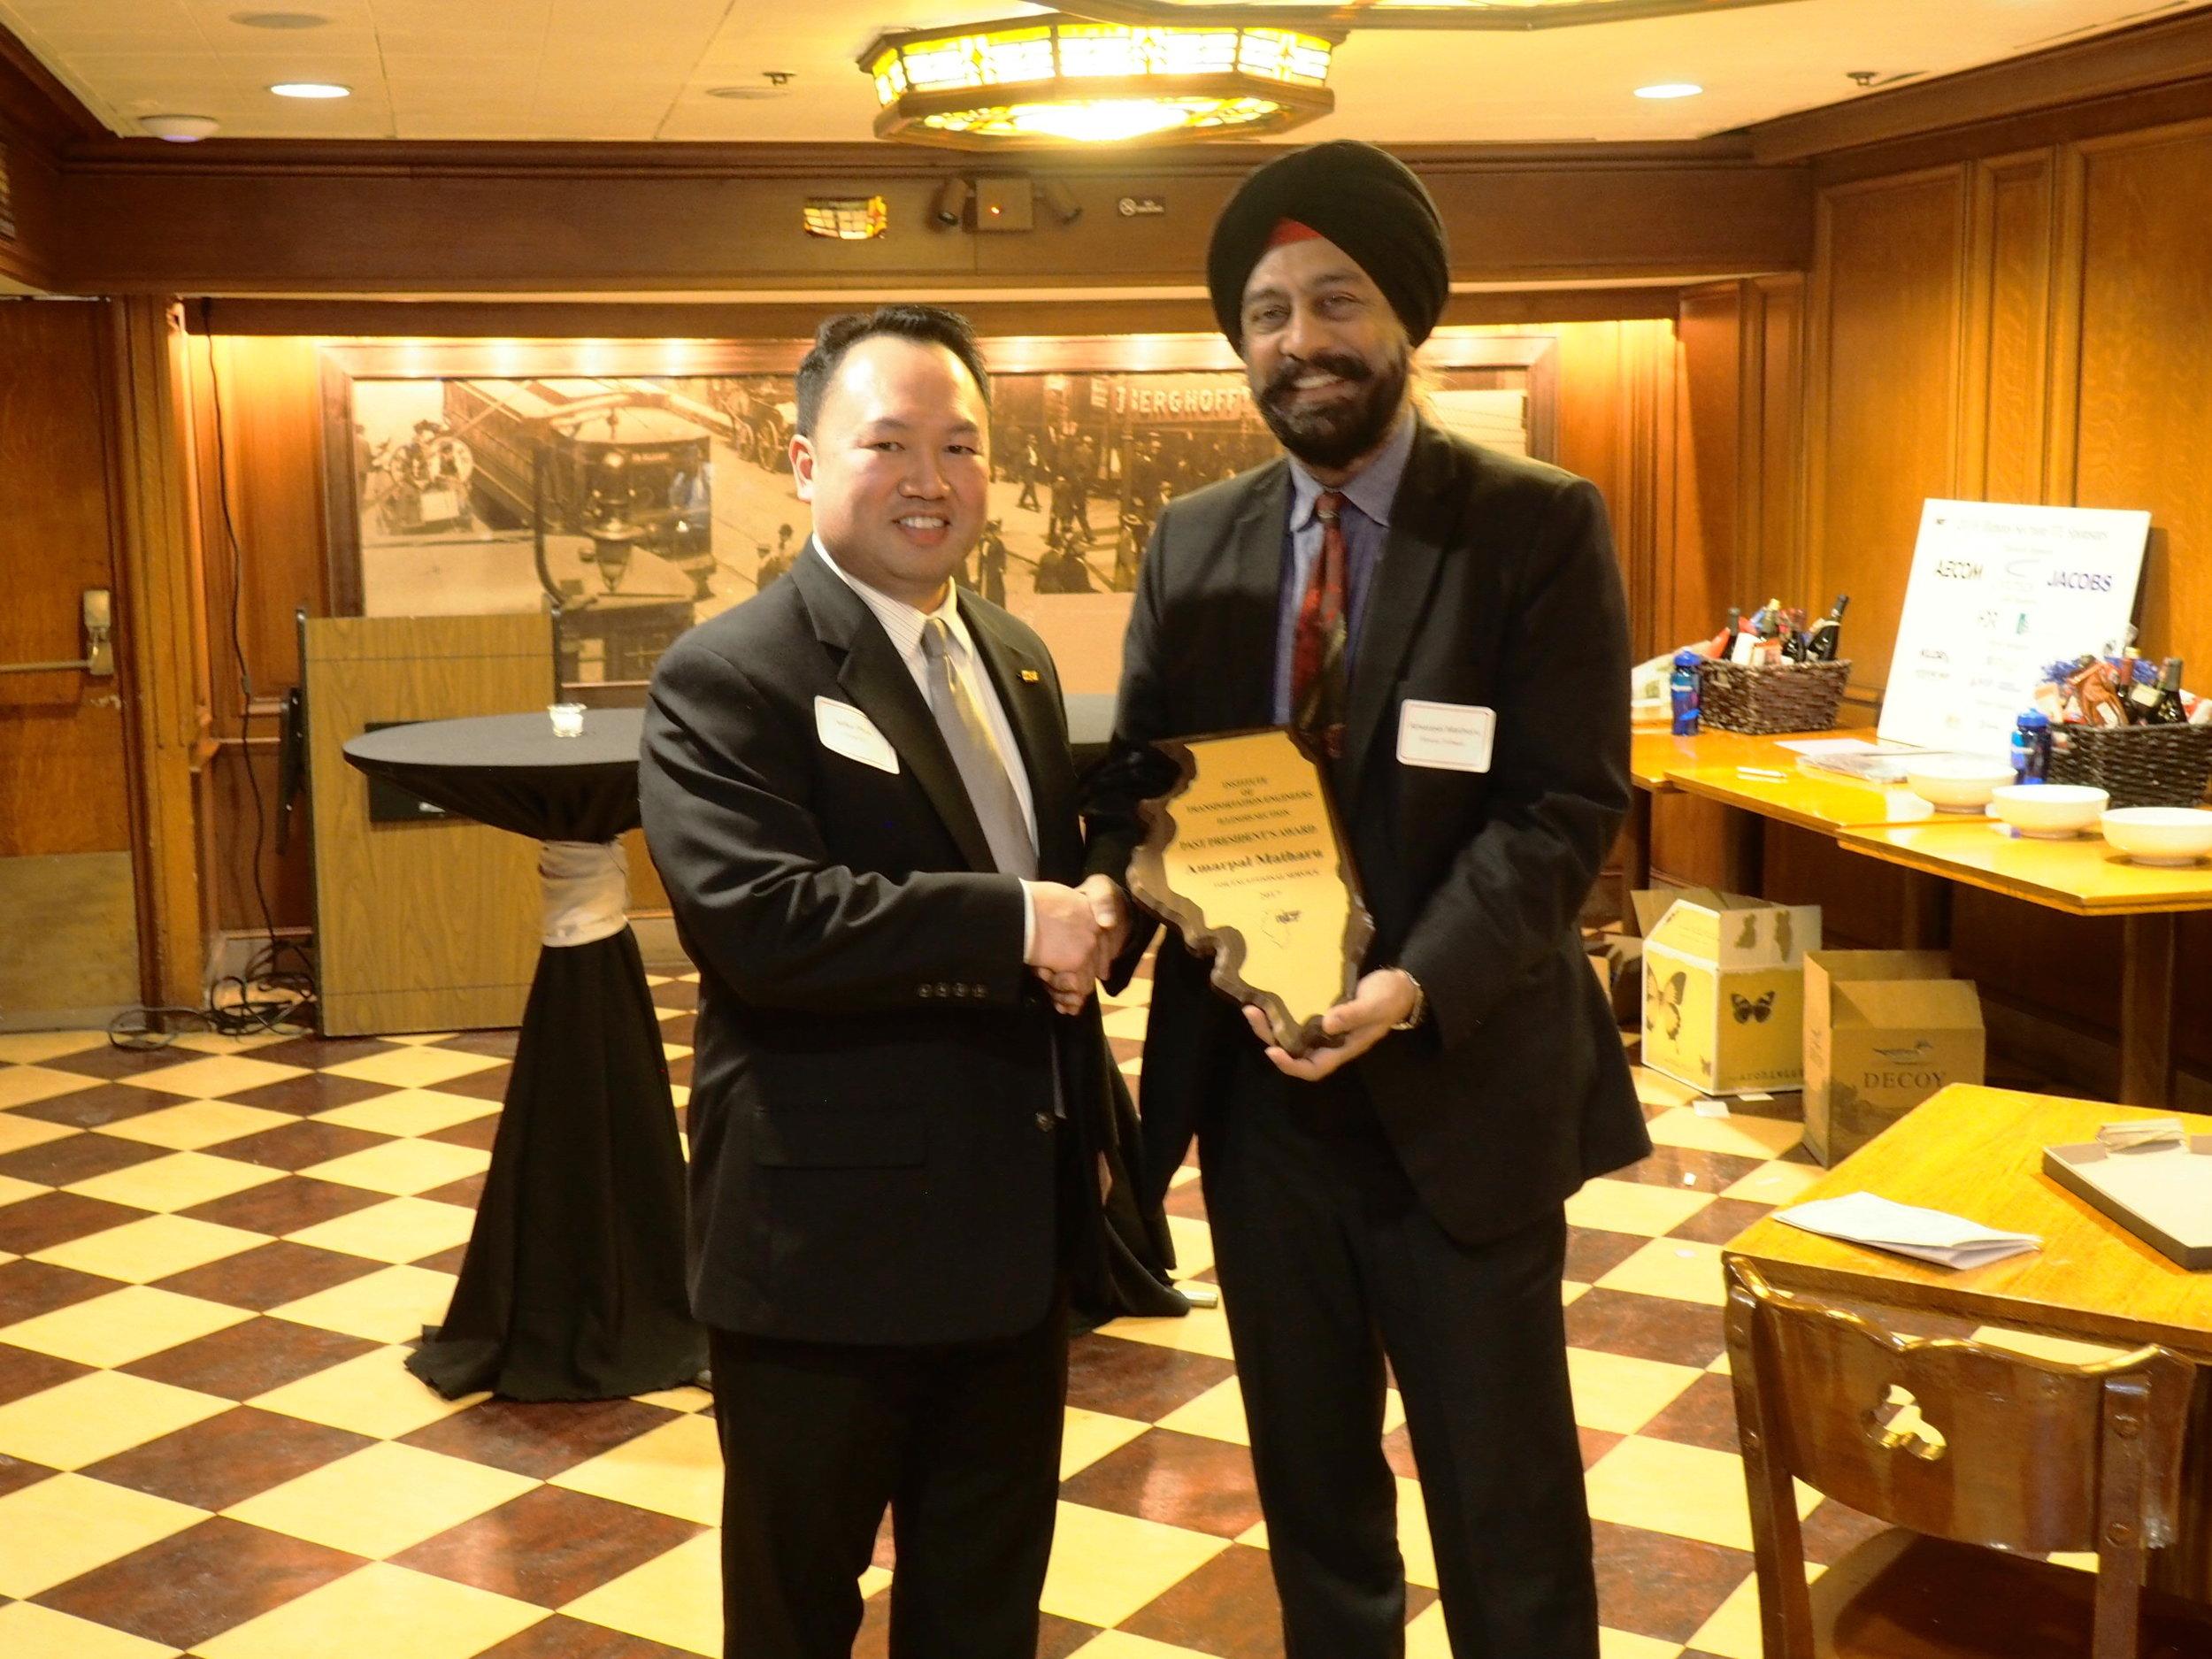 Past President's Award - Amarpal Matharu